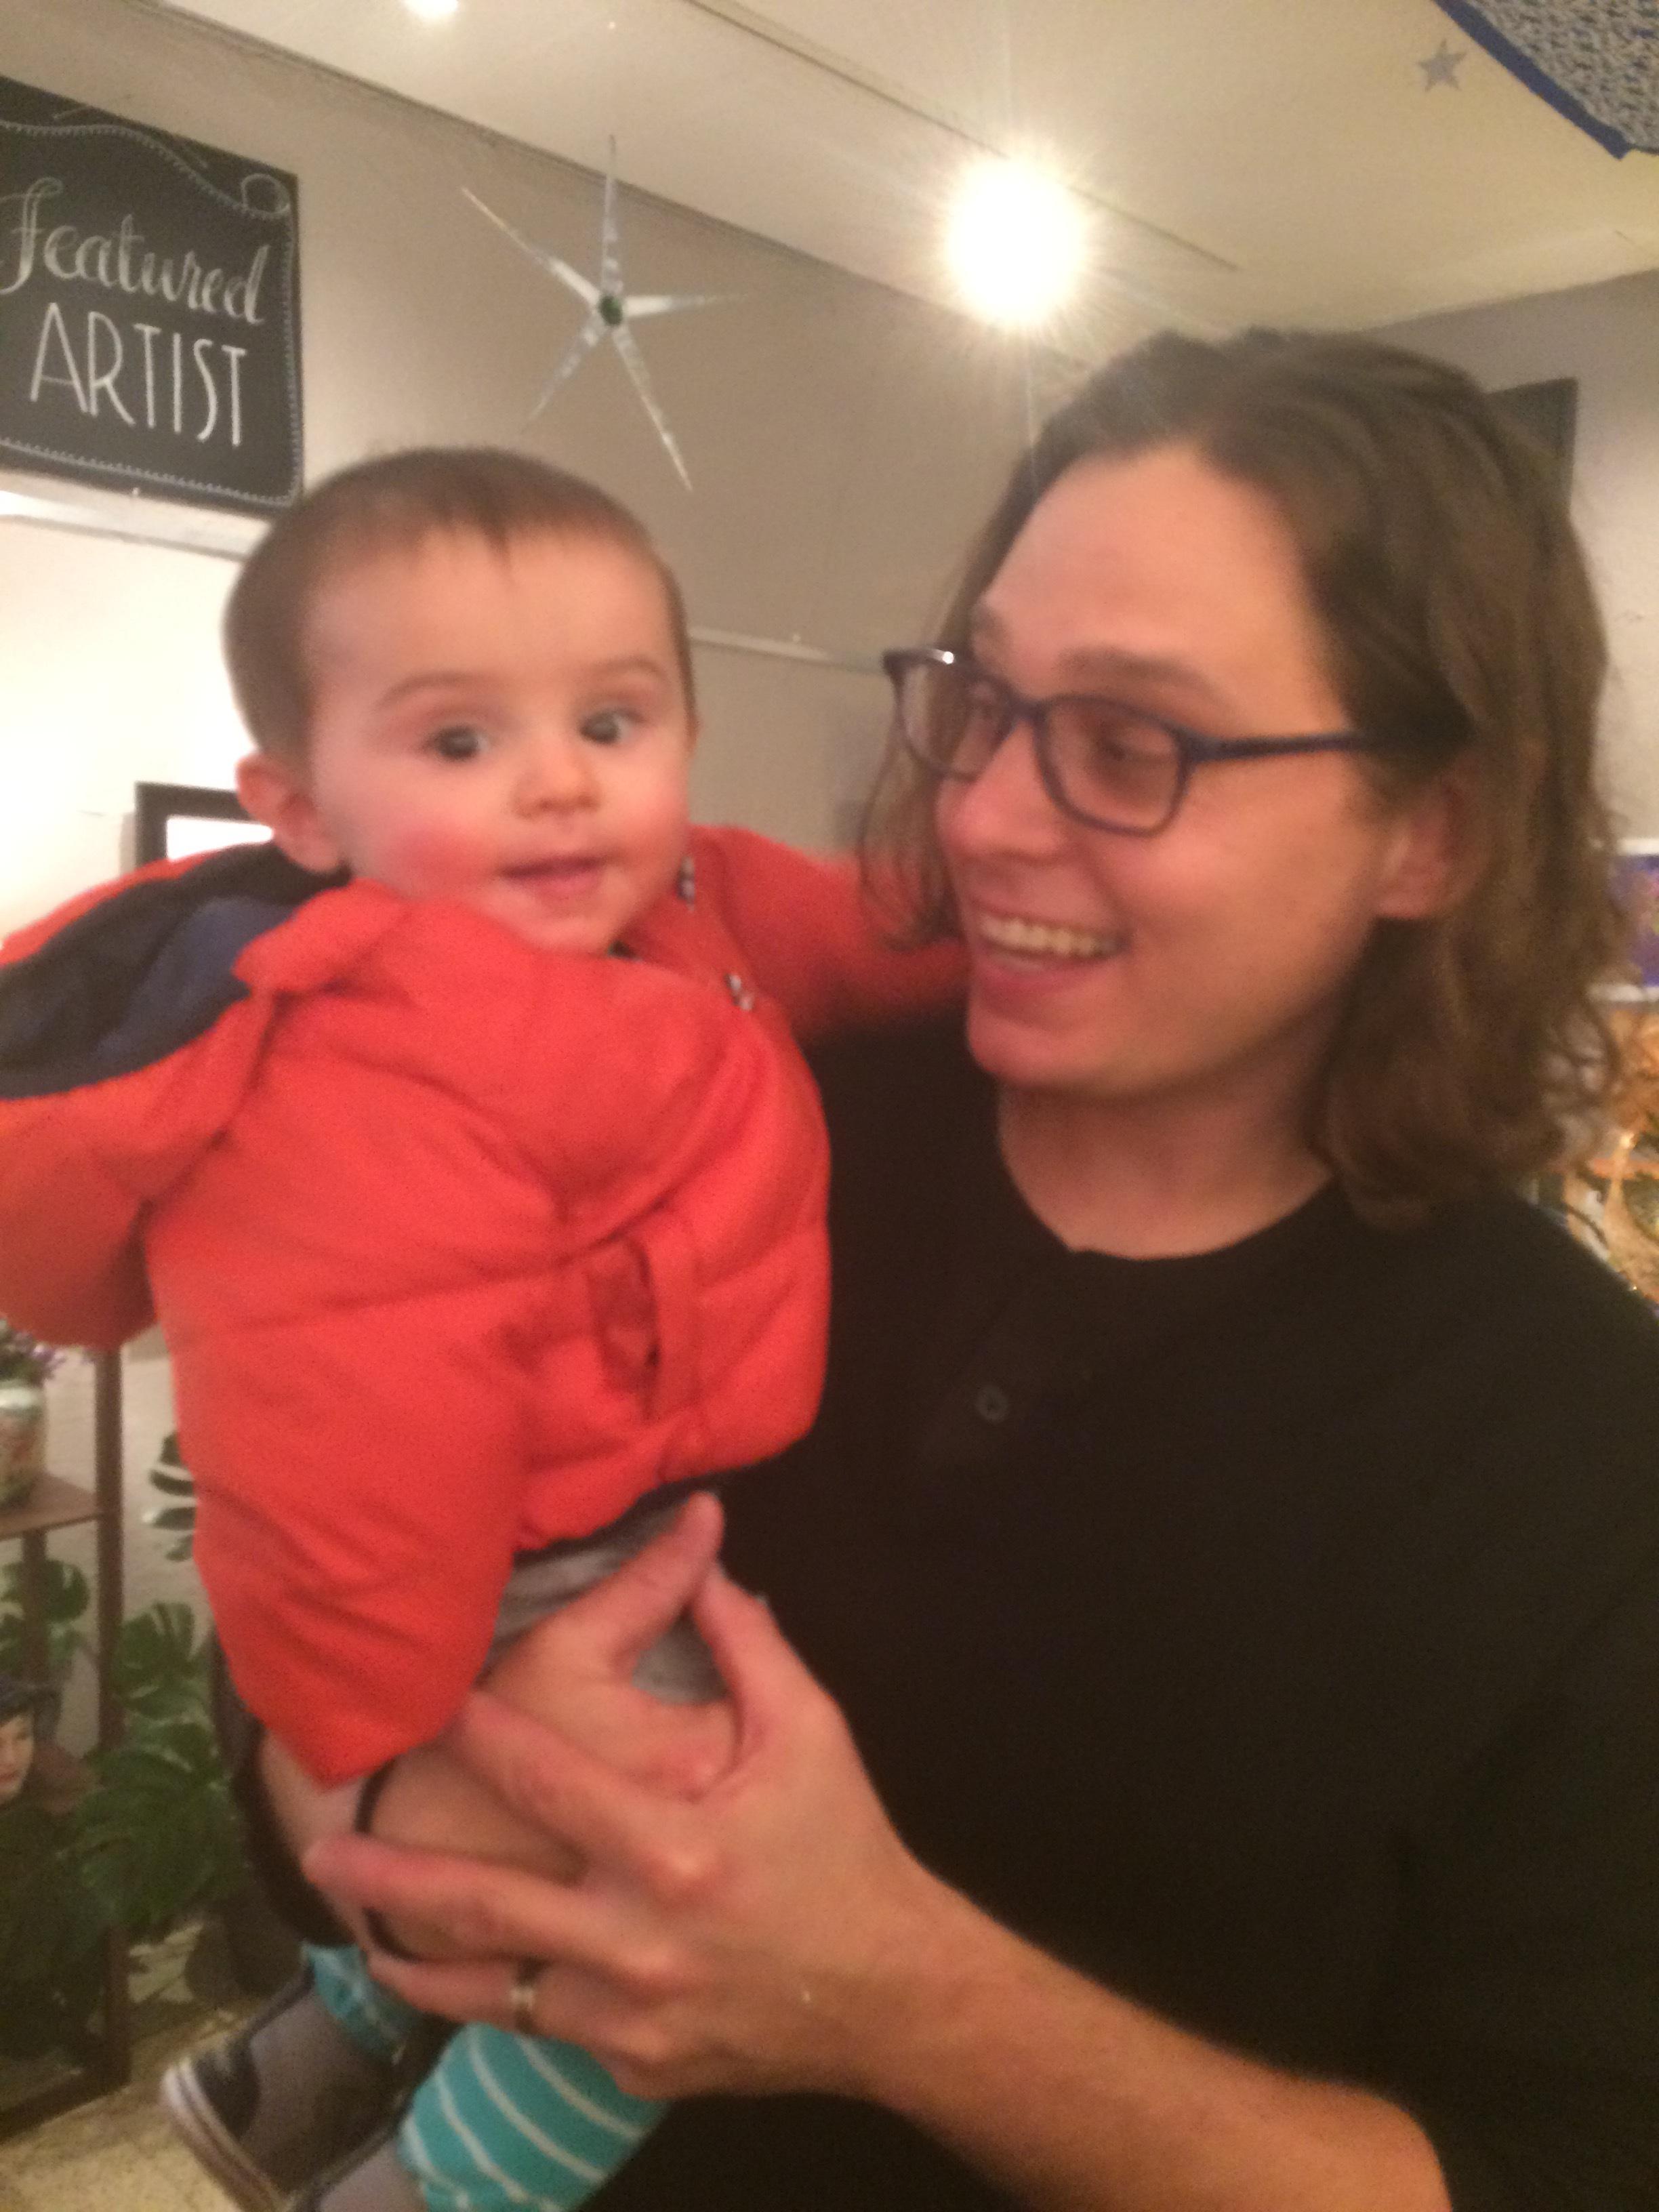 Emmett and Luke Funk